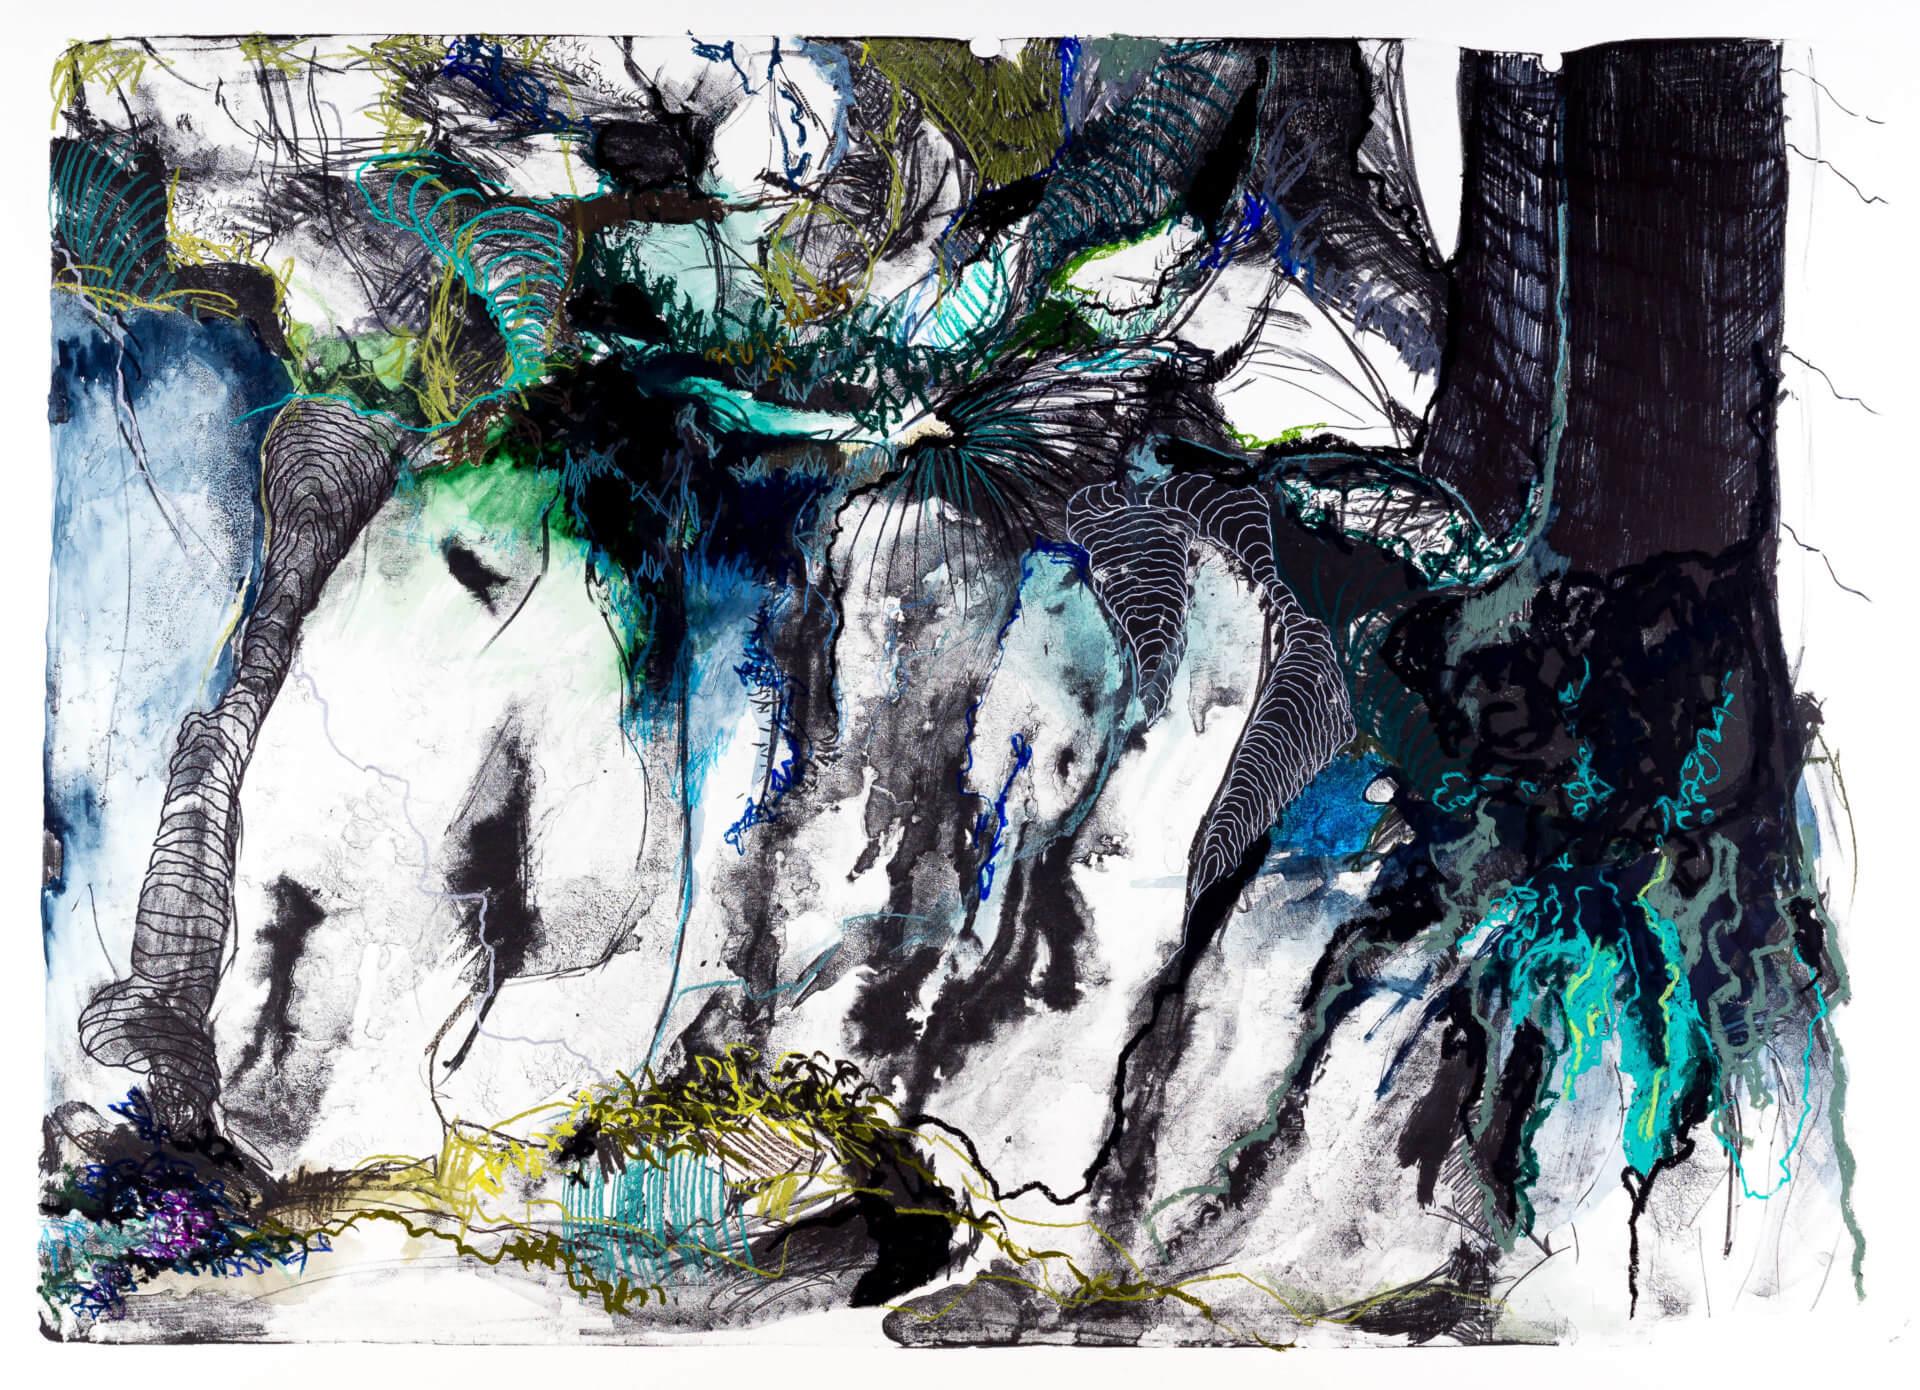 Katharina Albers, Wald (F_A)(B), 2015, Lithographie handkoloriert (Ölkreide, Graphit, Aquarellfarbe, Fineliner), Unikat, 70×100 cm